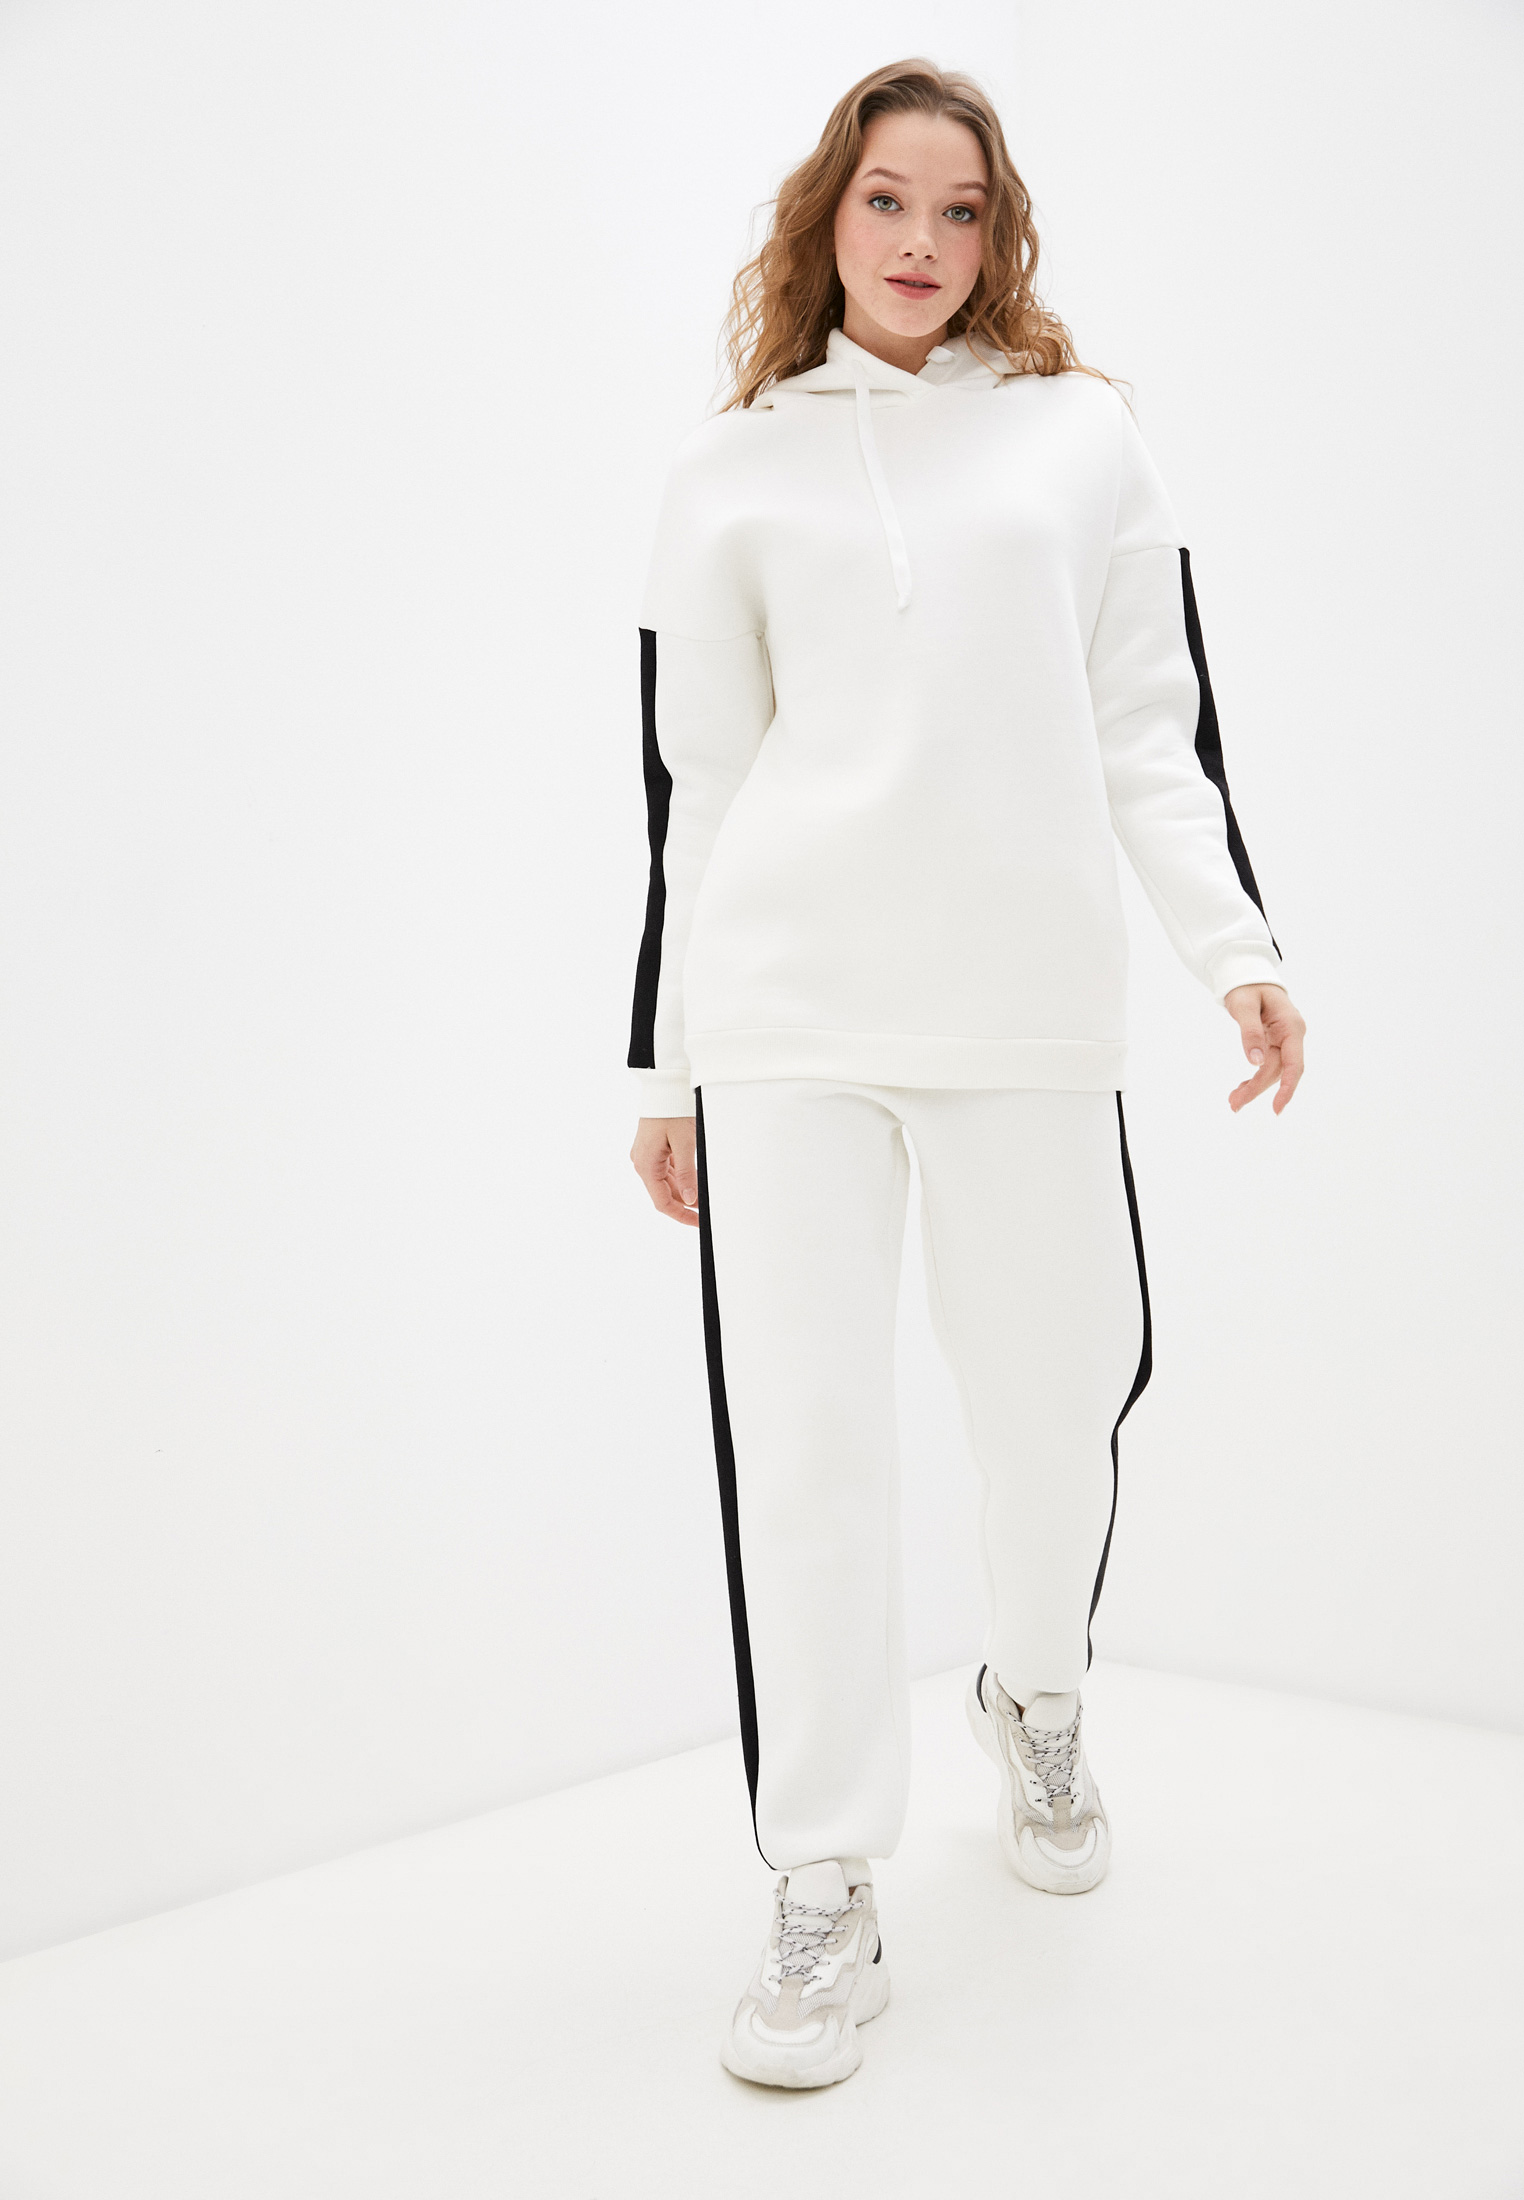 Спортивный костюм Toku Tino TT8519020a/